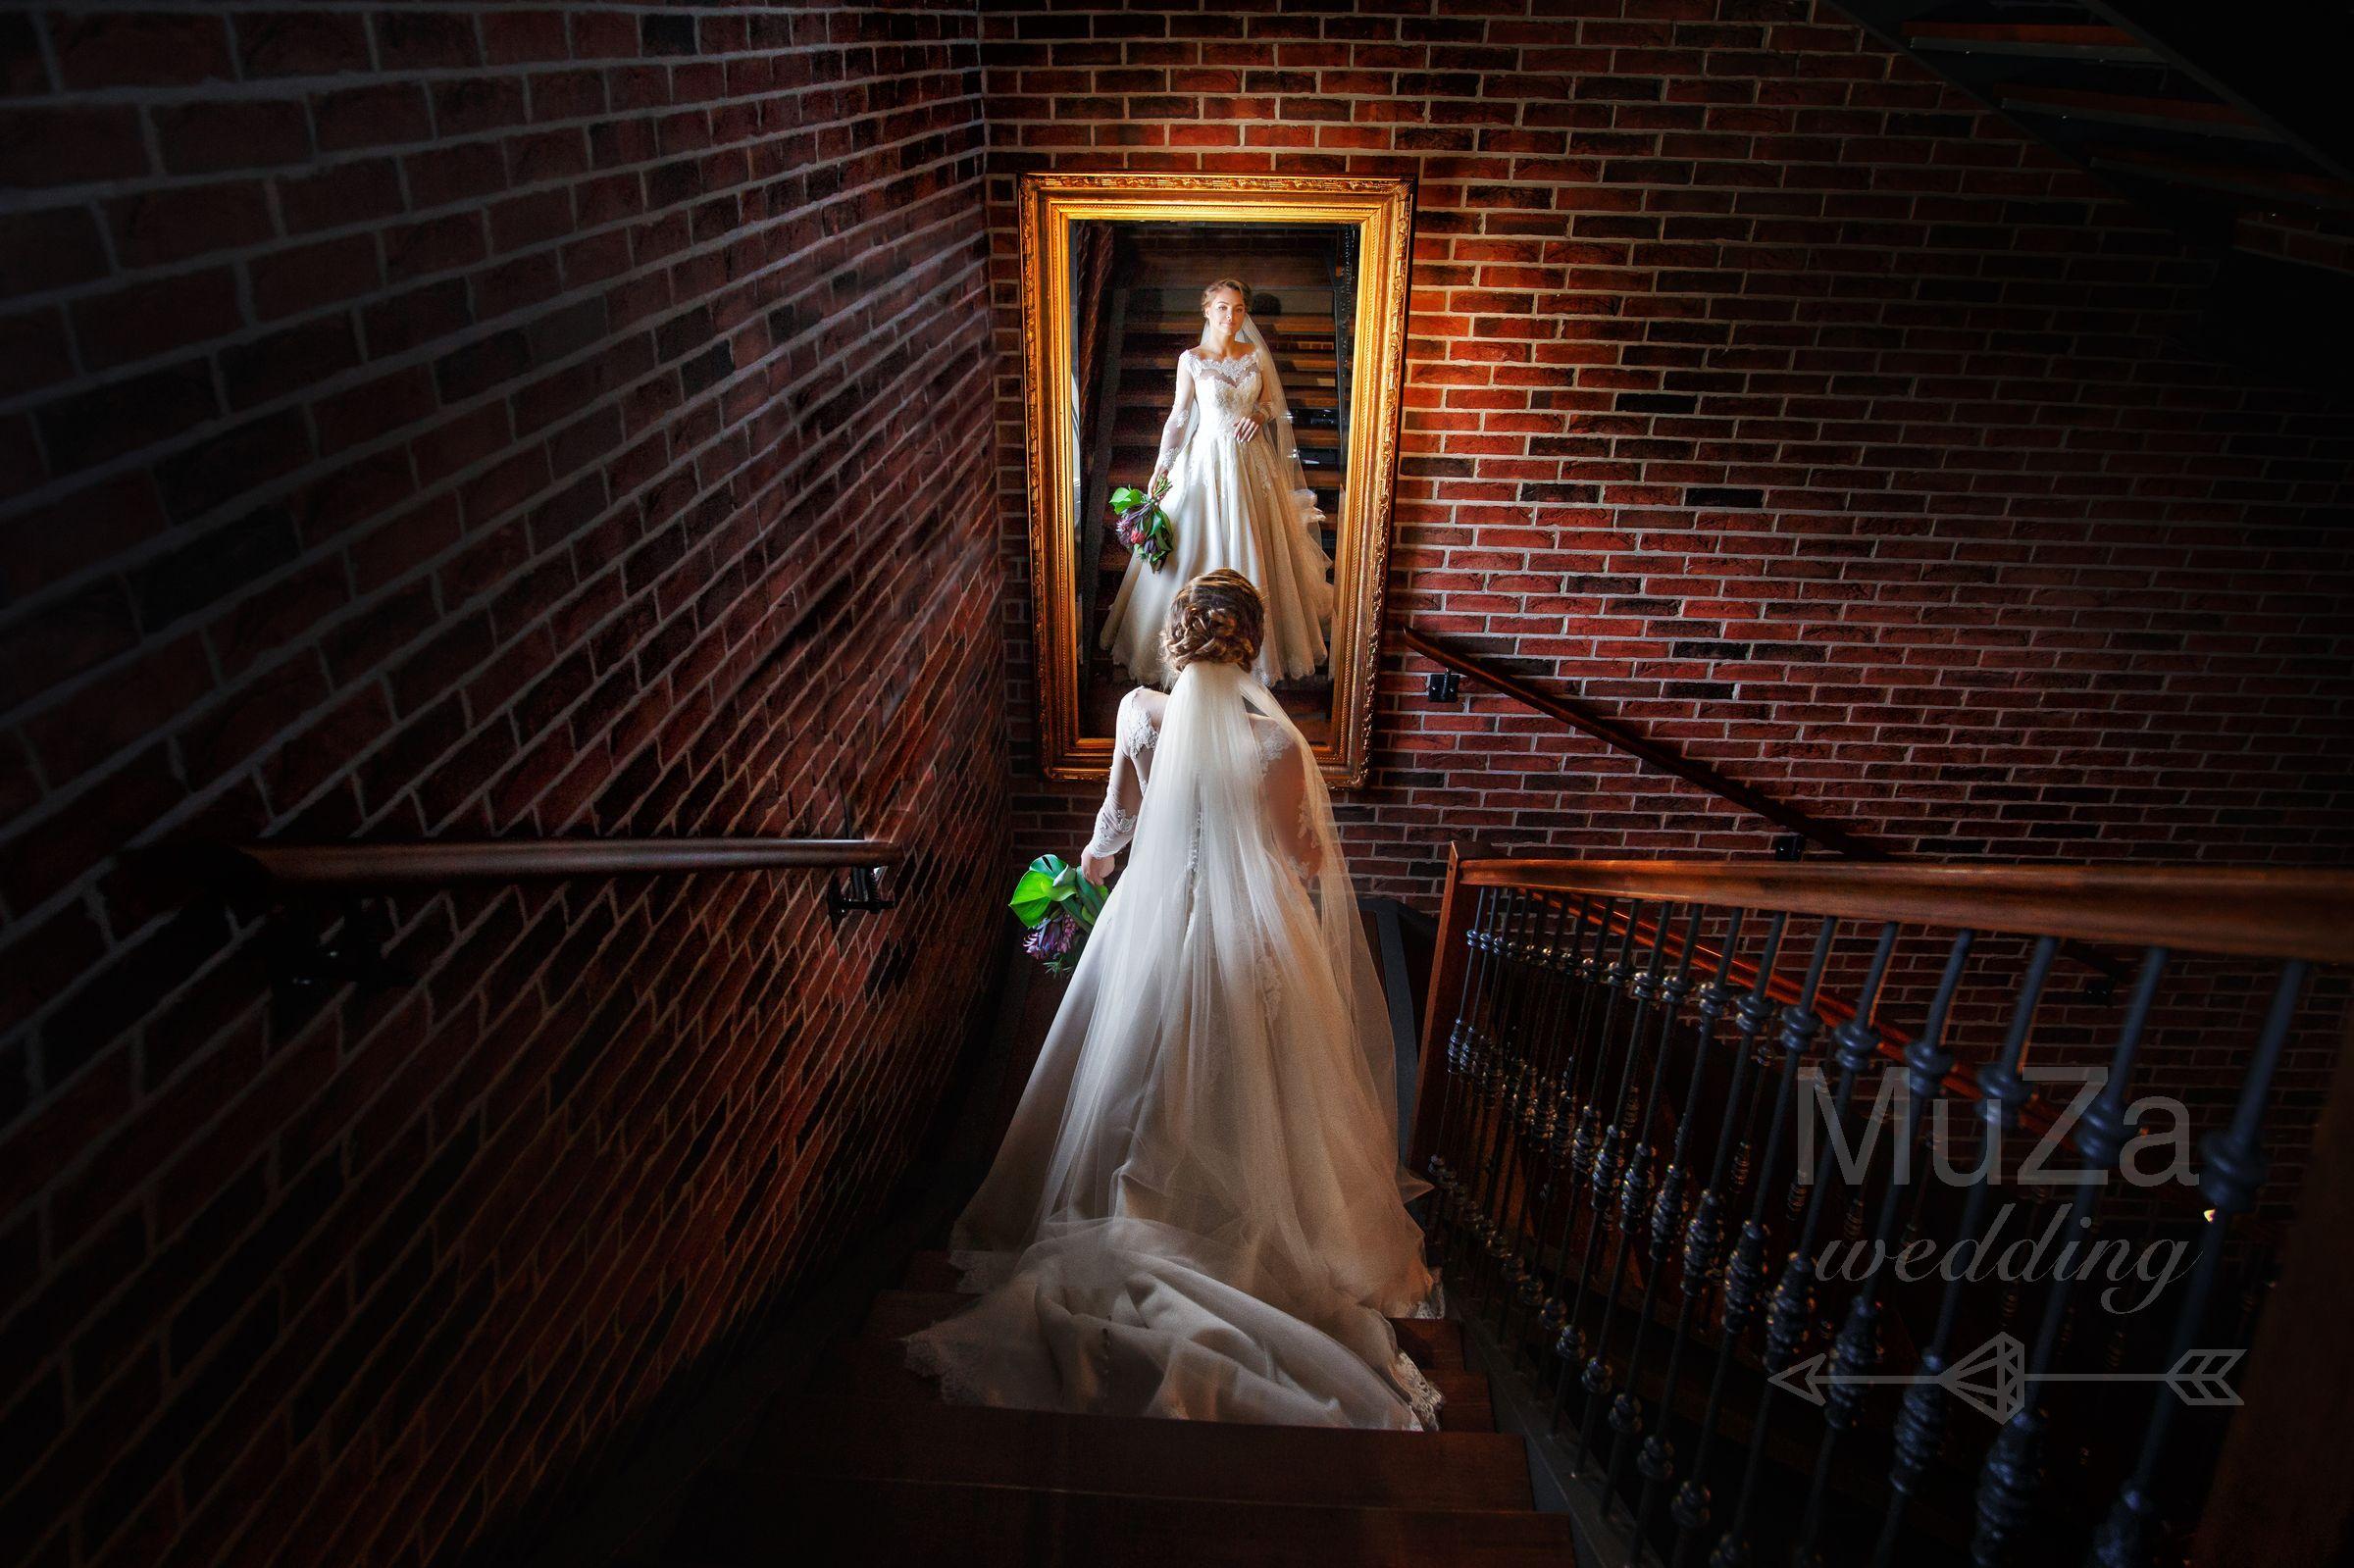 фото невевсты в зеркале на лестнице